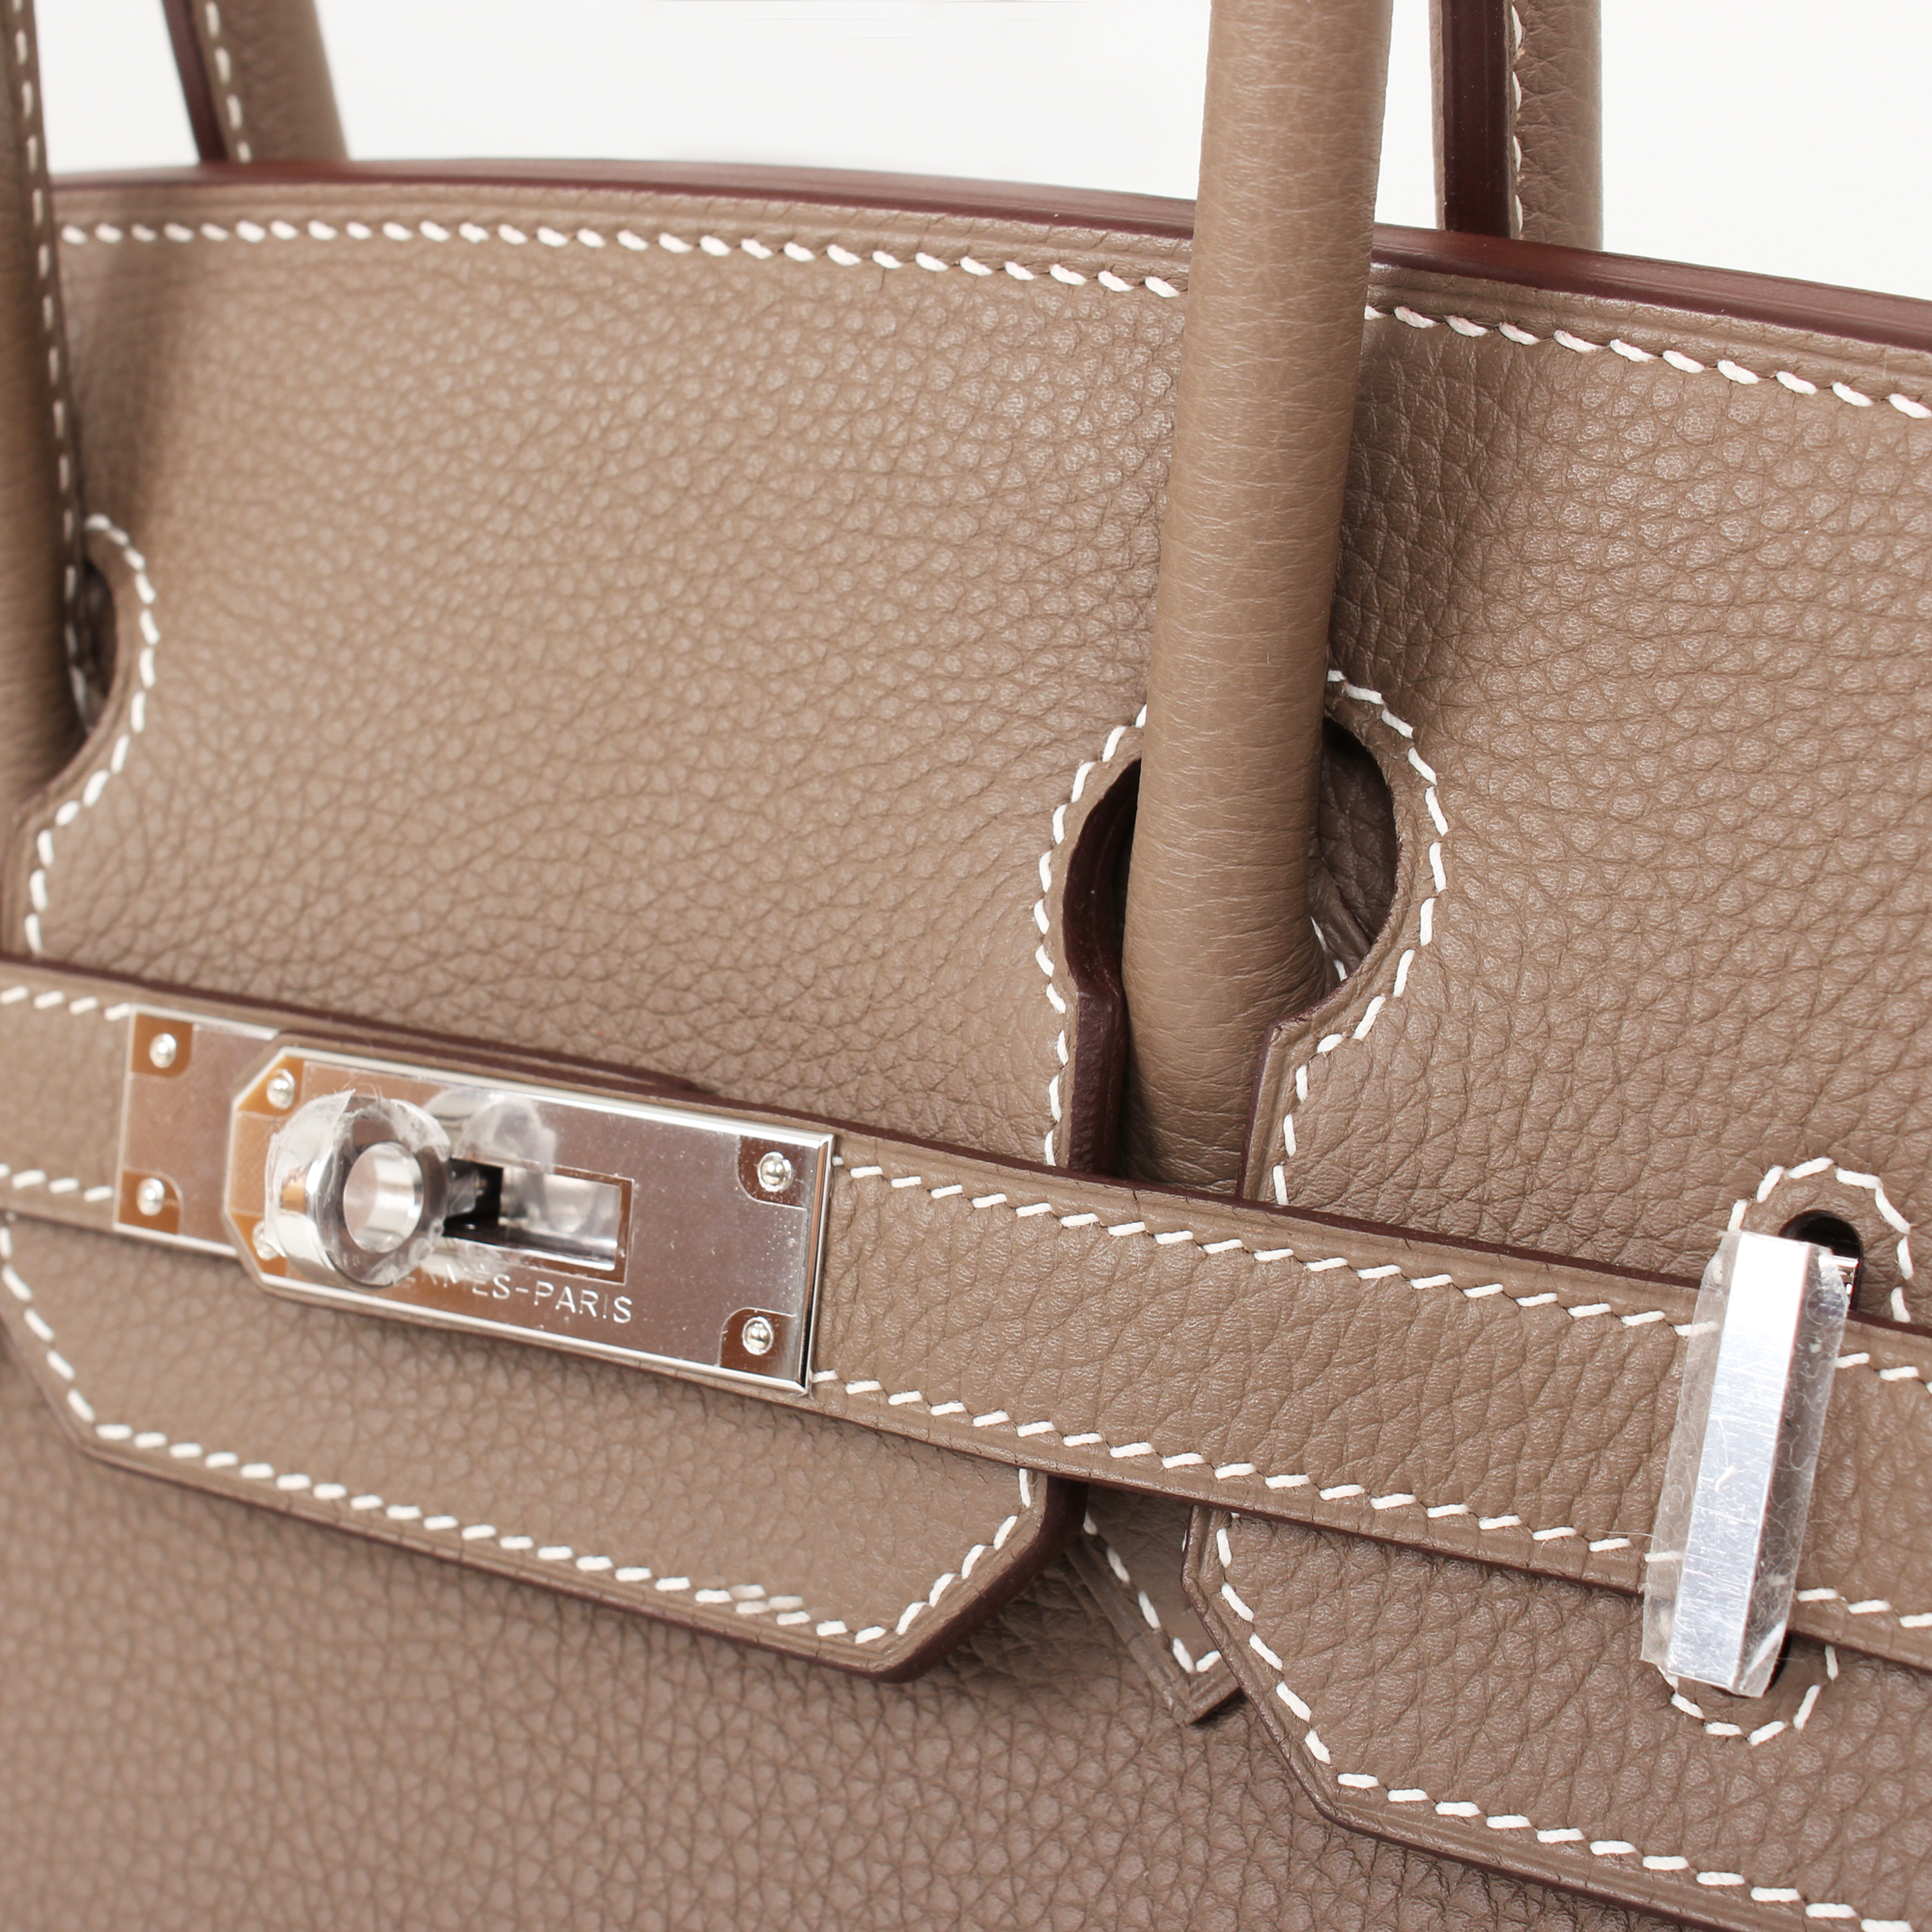 Image of the hardware of hermes birkin bag taupe togo